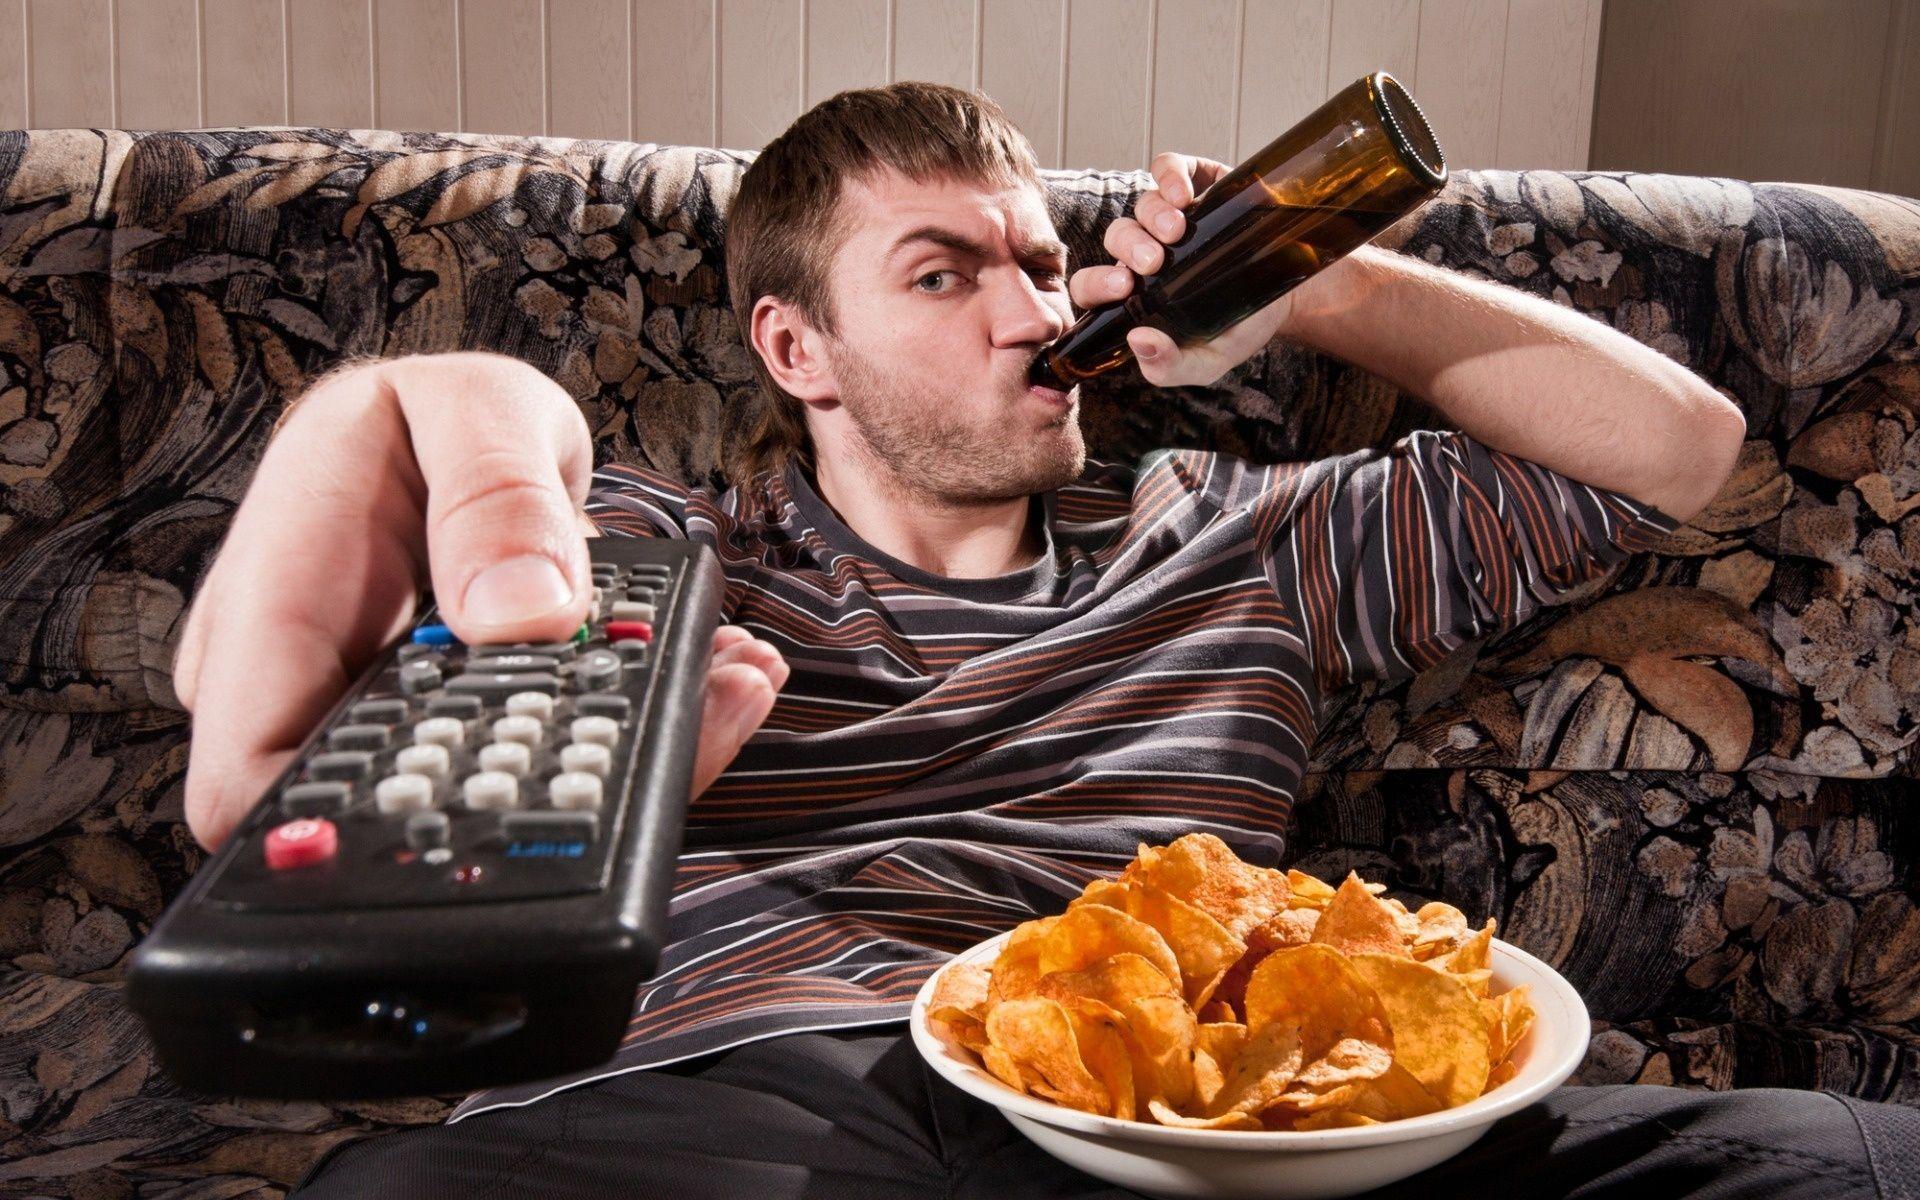 «Телеманьяки» не знают о принципах здорового питания